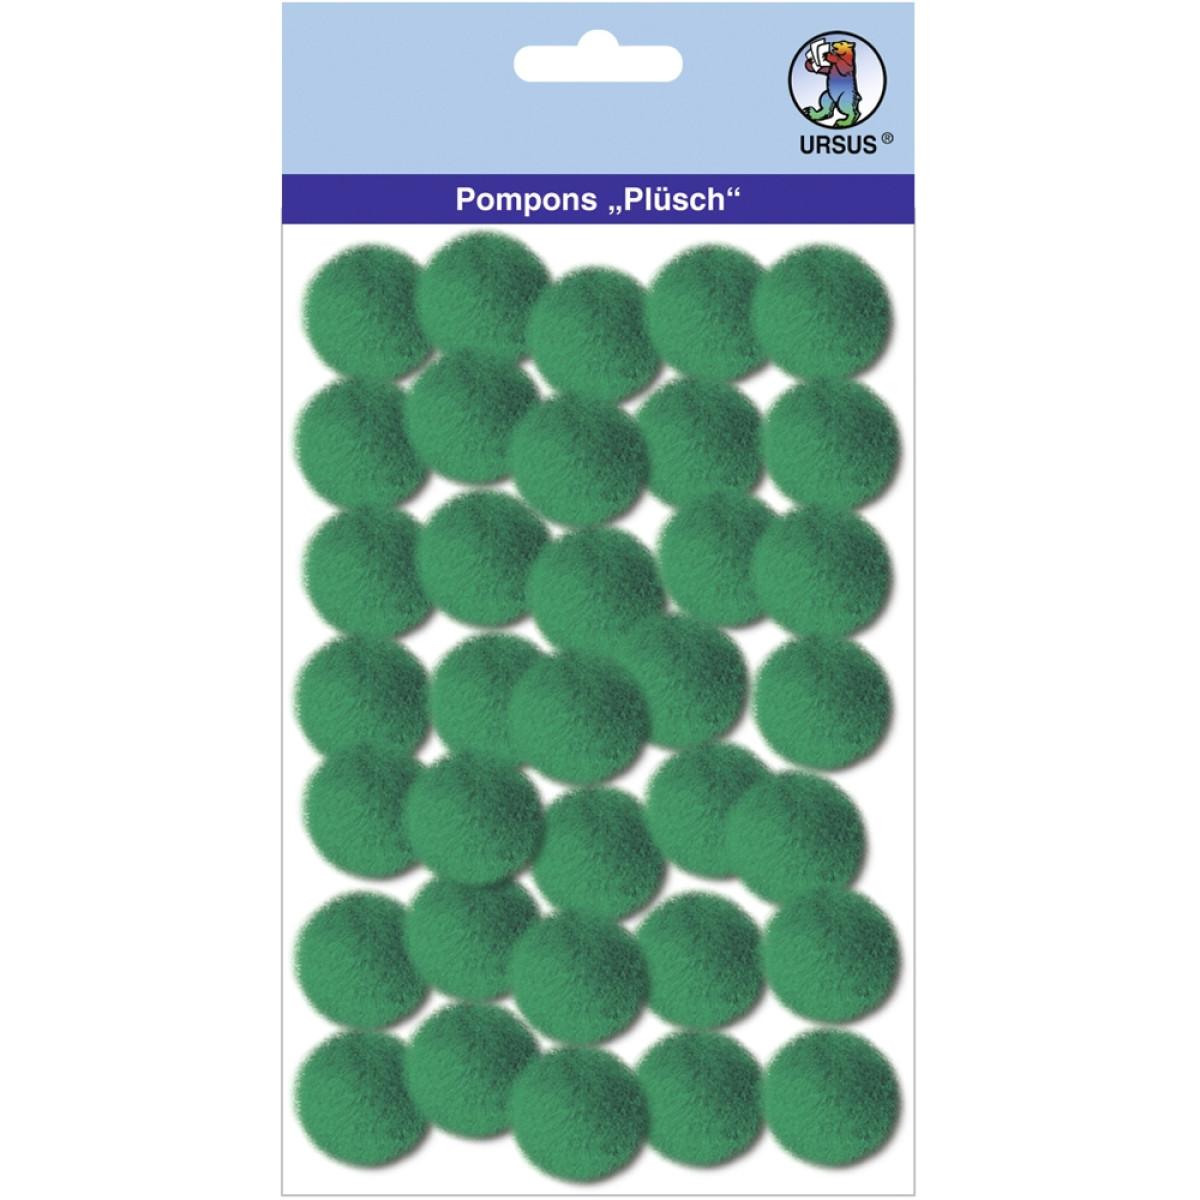 "Pompons ""Plüsch"" 25 mm dunkelgrün"